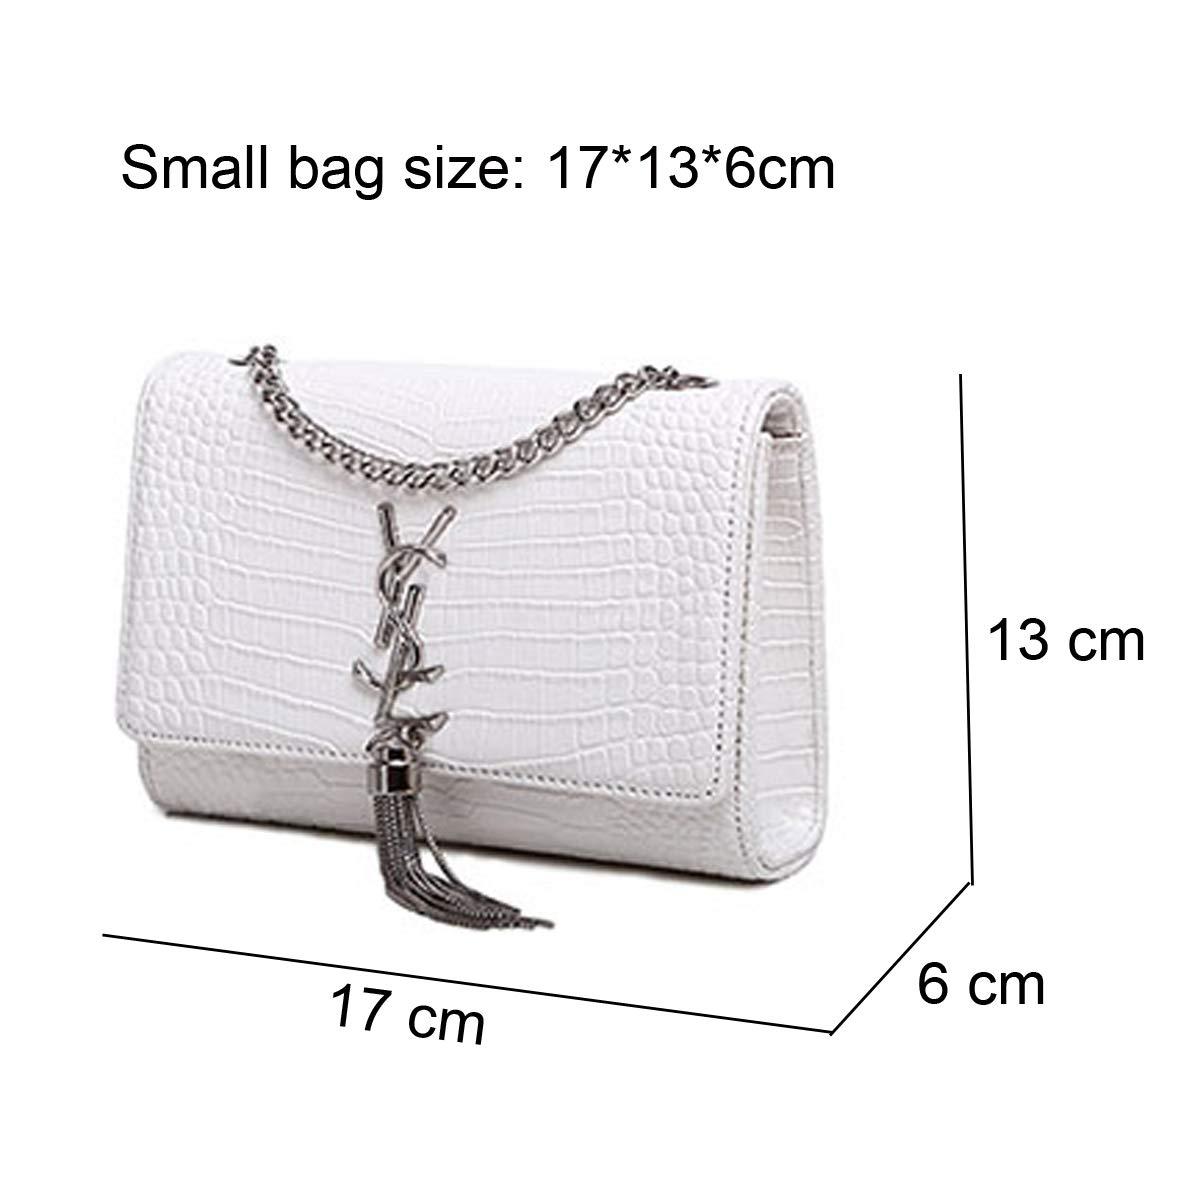 d027b656ef SHRJJ 2018 Fashion One Shoulder Crossbody Bags High Quality Leather  Shoulder Bag Large Capacity Room Baby Diaper Bag for Women (Small -17   13    6CM